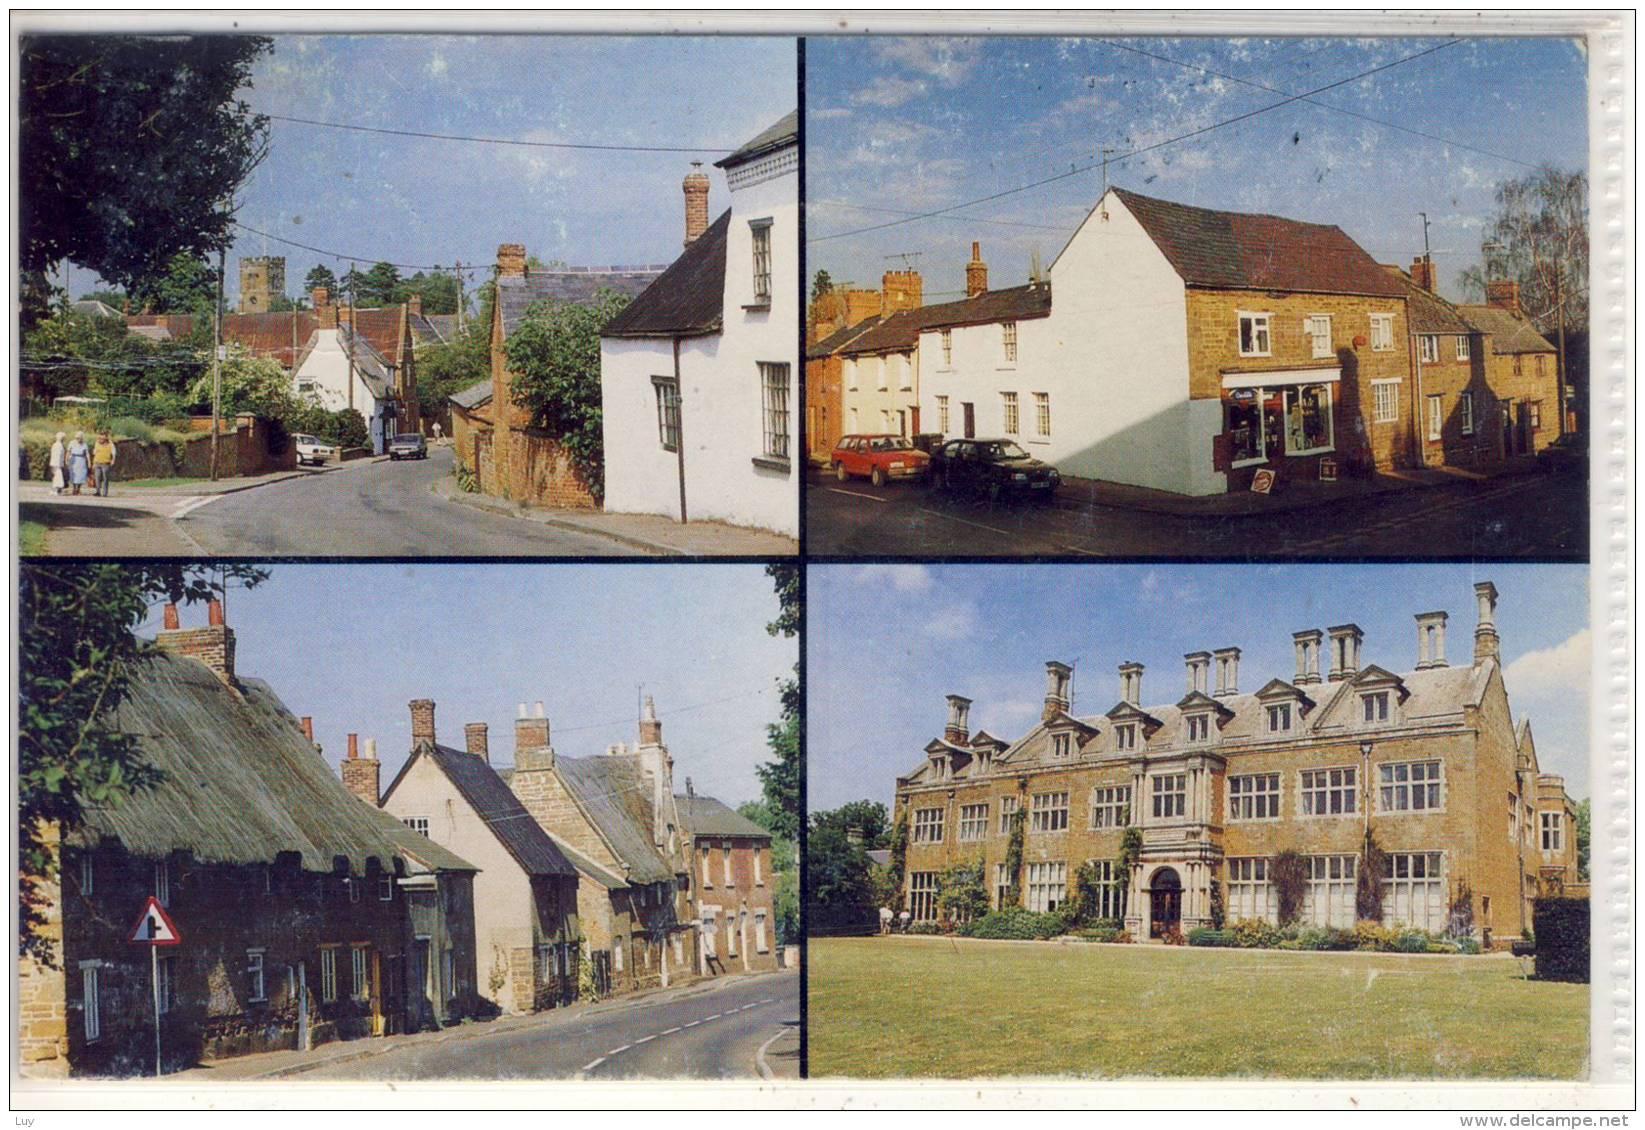 NORTHAMPTONSHIRE - Ravensthorpe, East Haddon, Spratton, .... - Northamptonshire